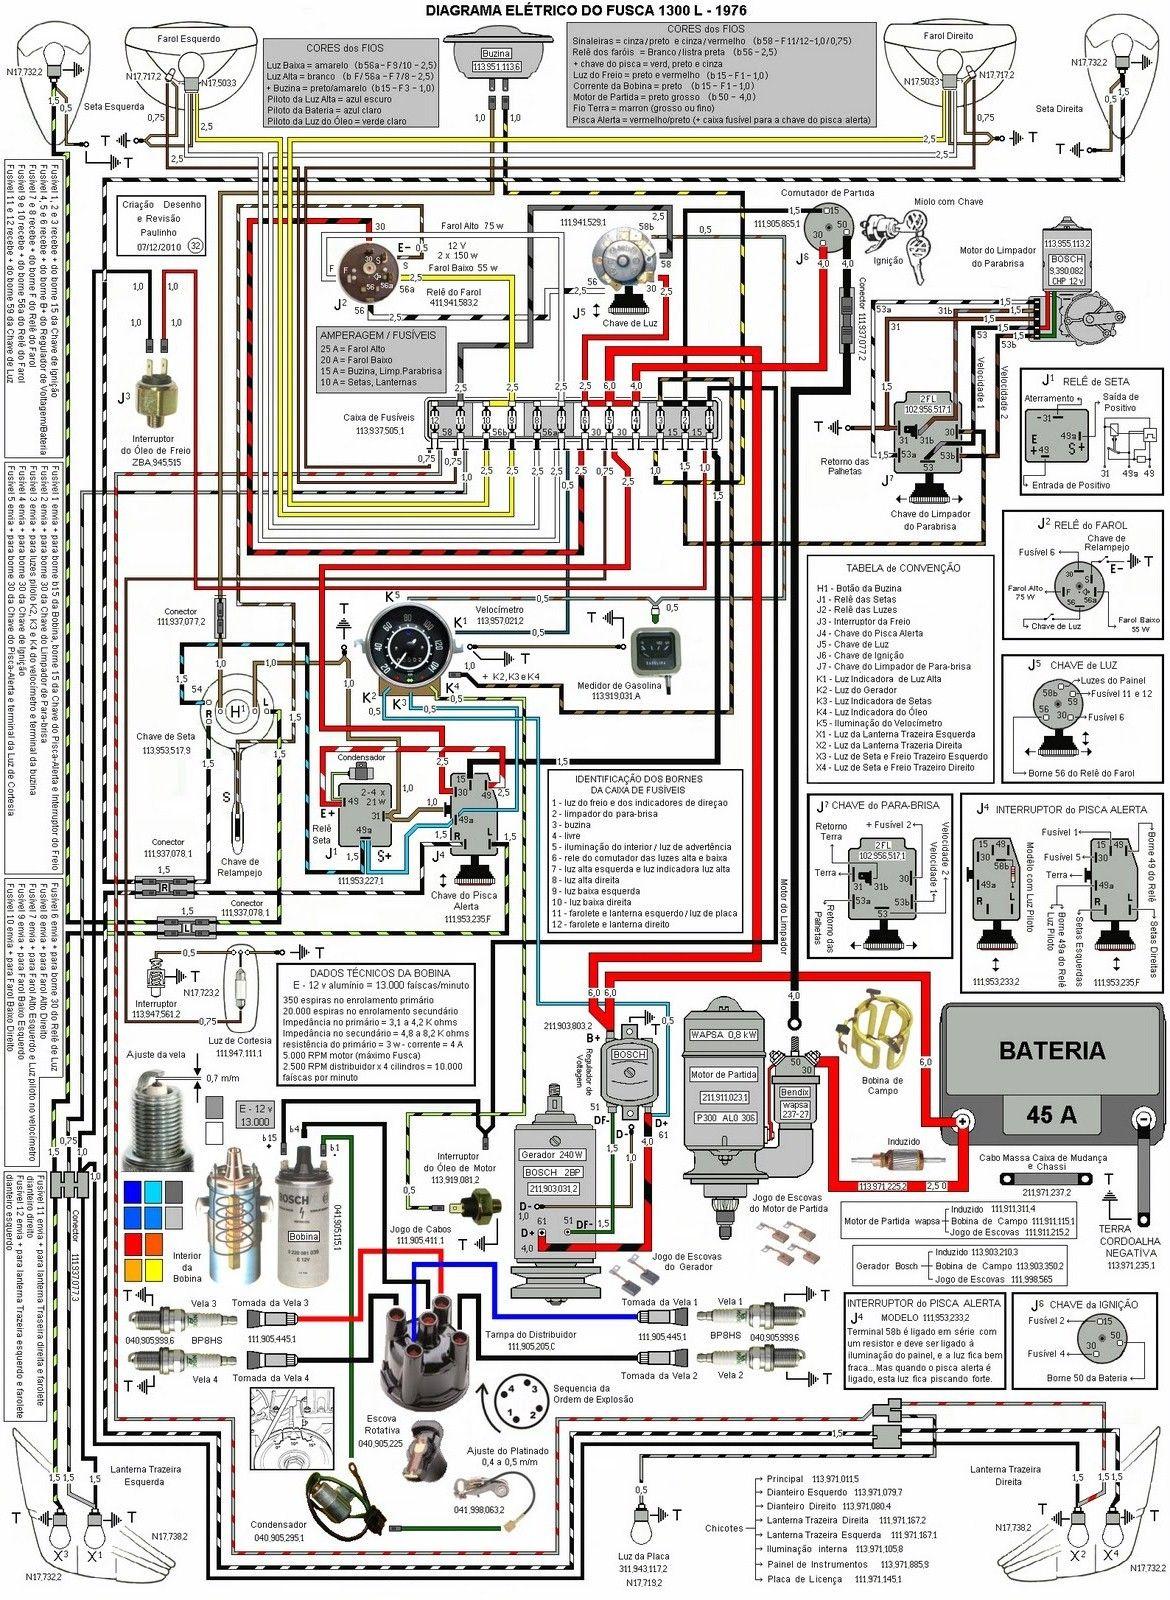 Esquema 12 Volts: Esquema Elétrico Fusca Completo | Volkswagen à Ar  Elétrica | Fusca eletrico